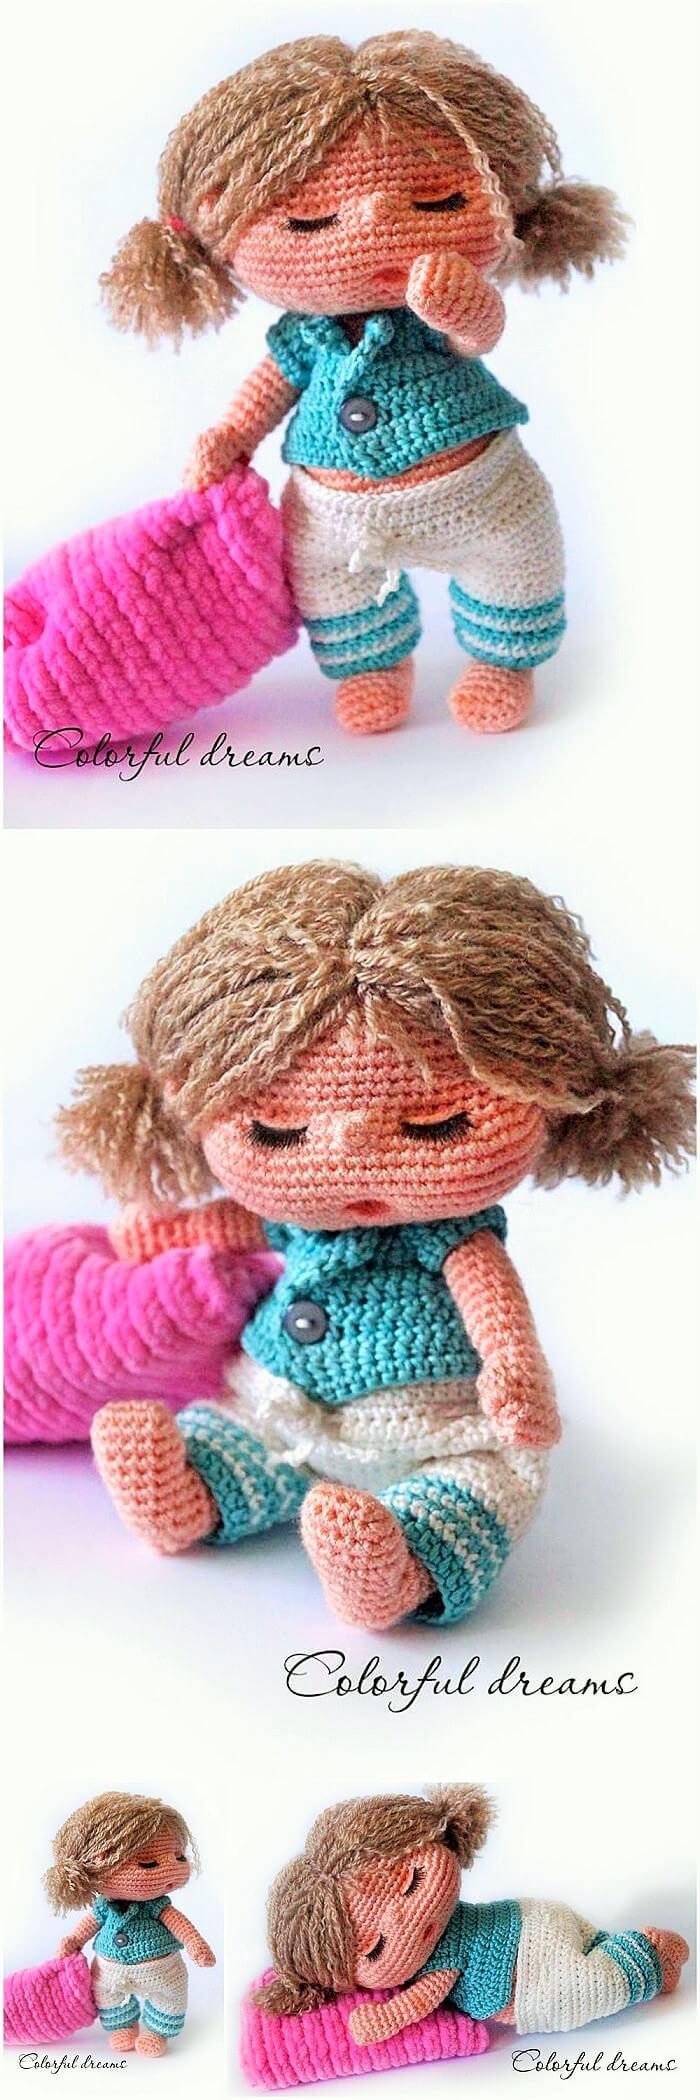 DIY crochet Toyes -Ideas (2)